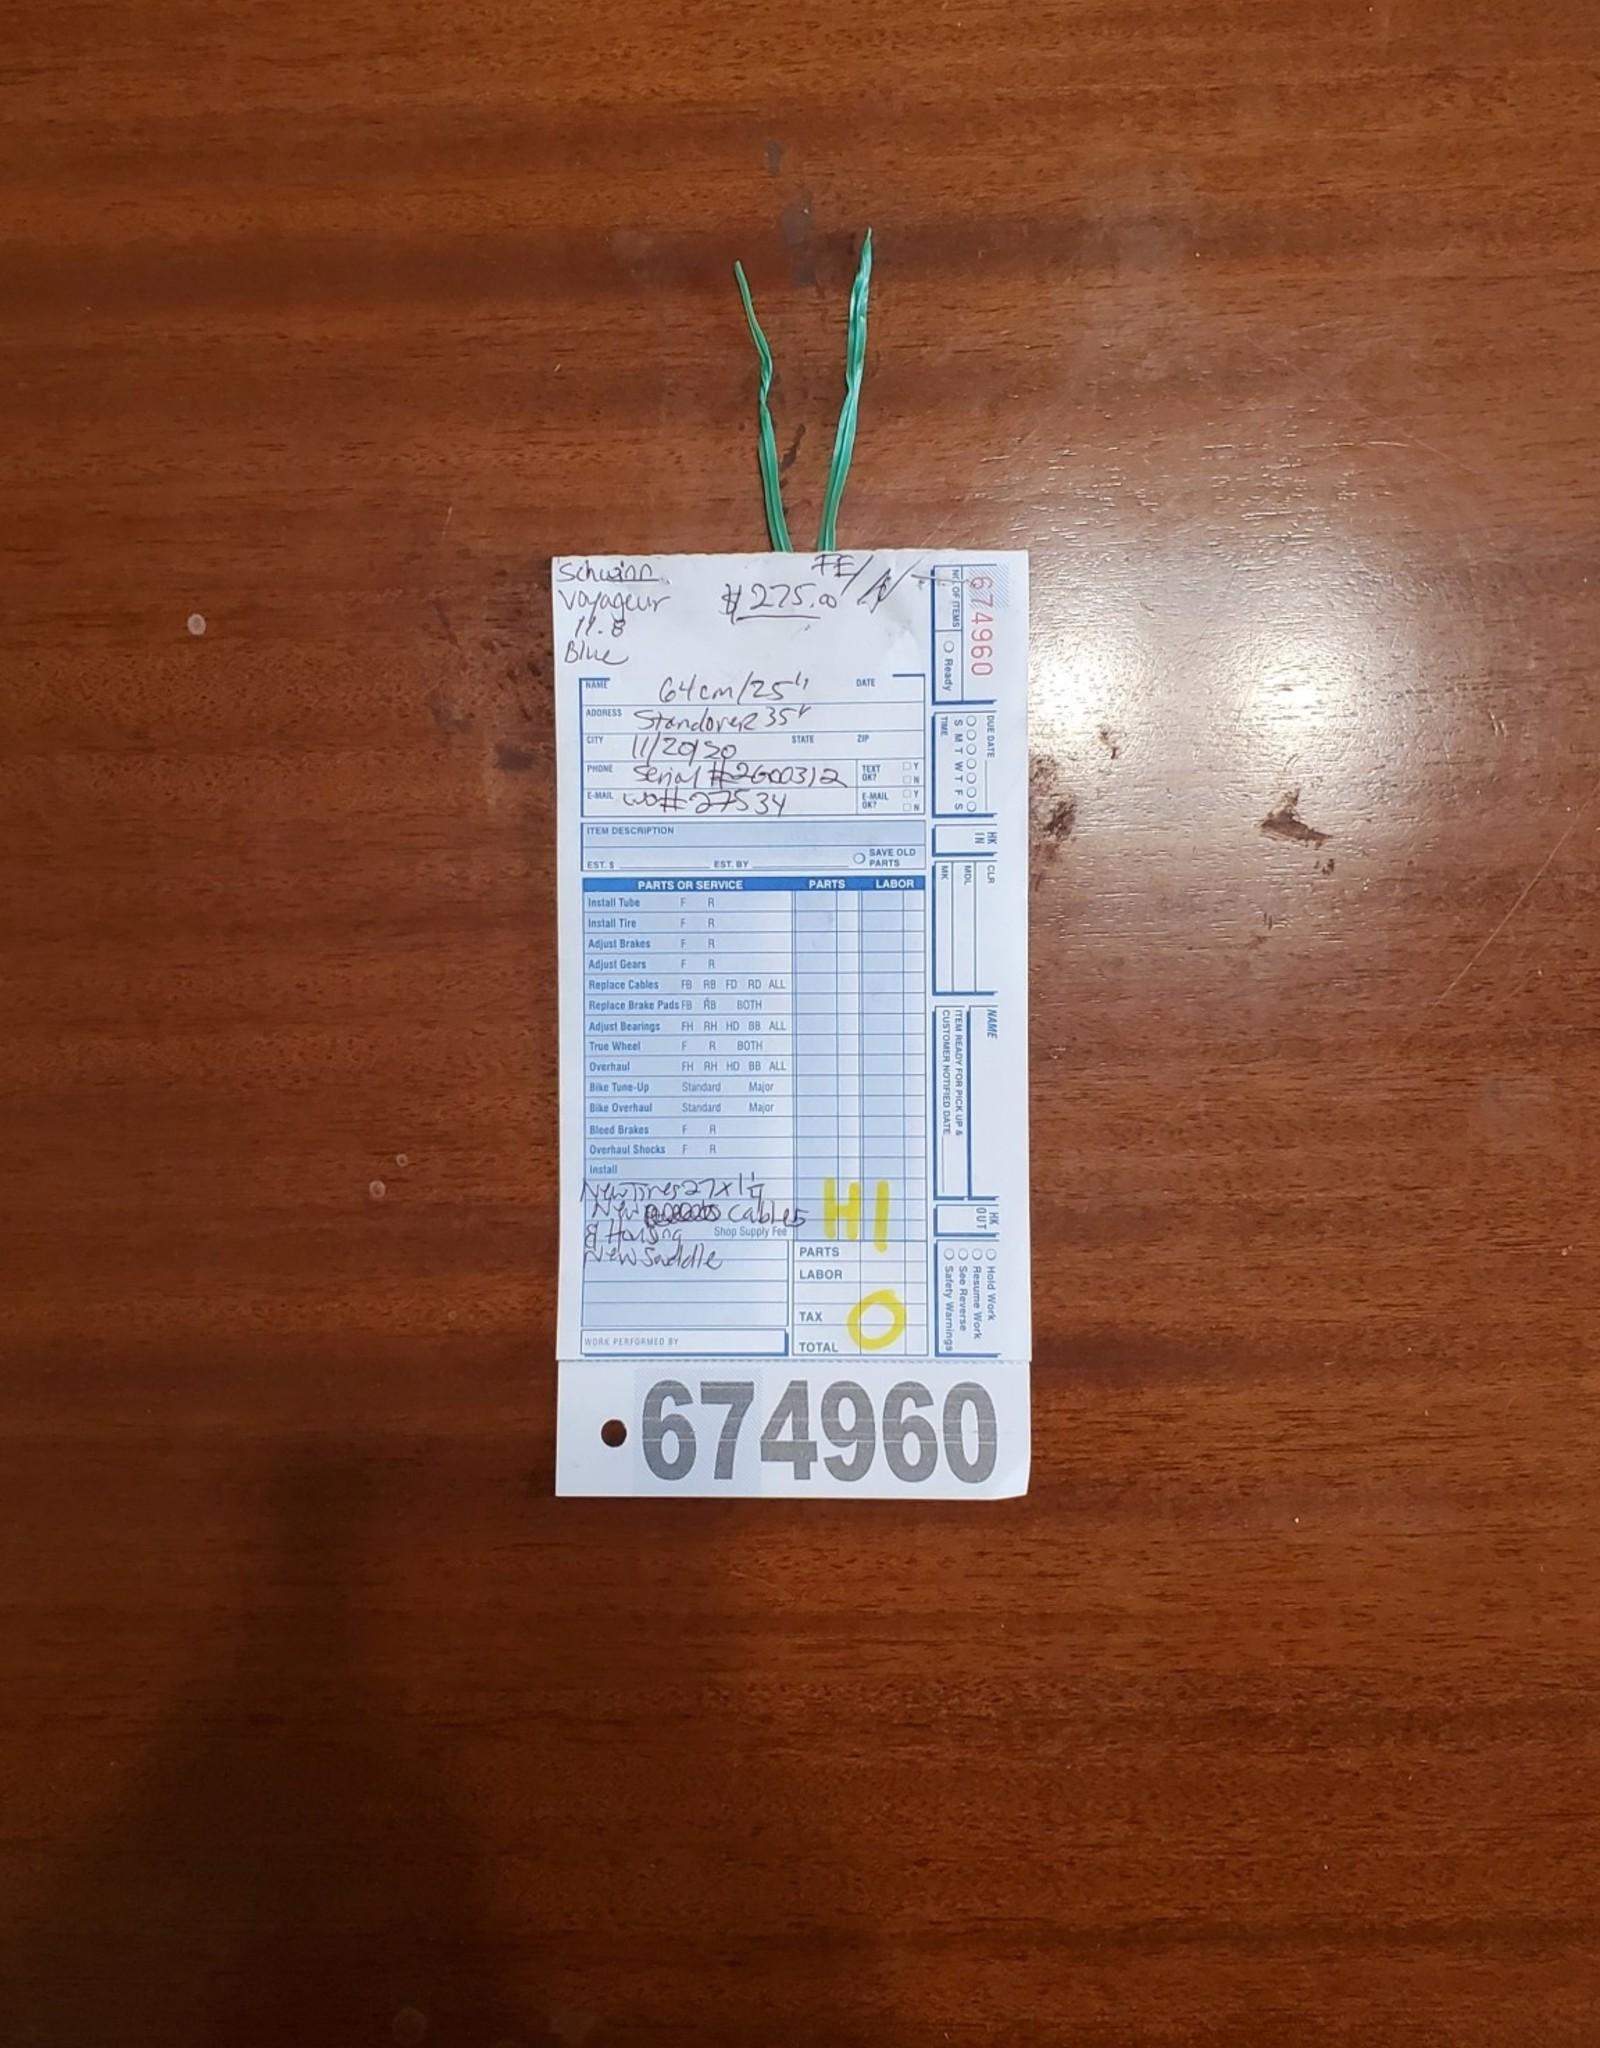 64cm  schwinn voyageur 11.8 (0312 H1U)